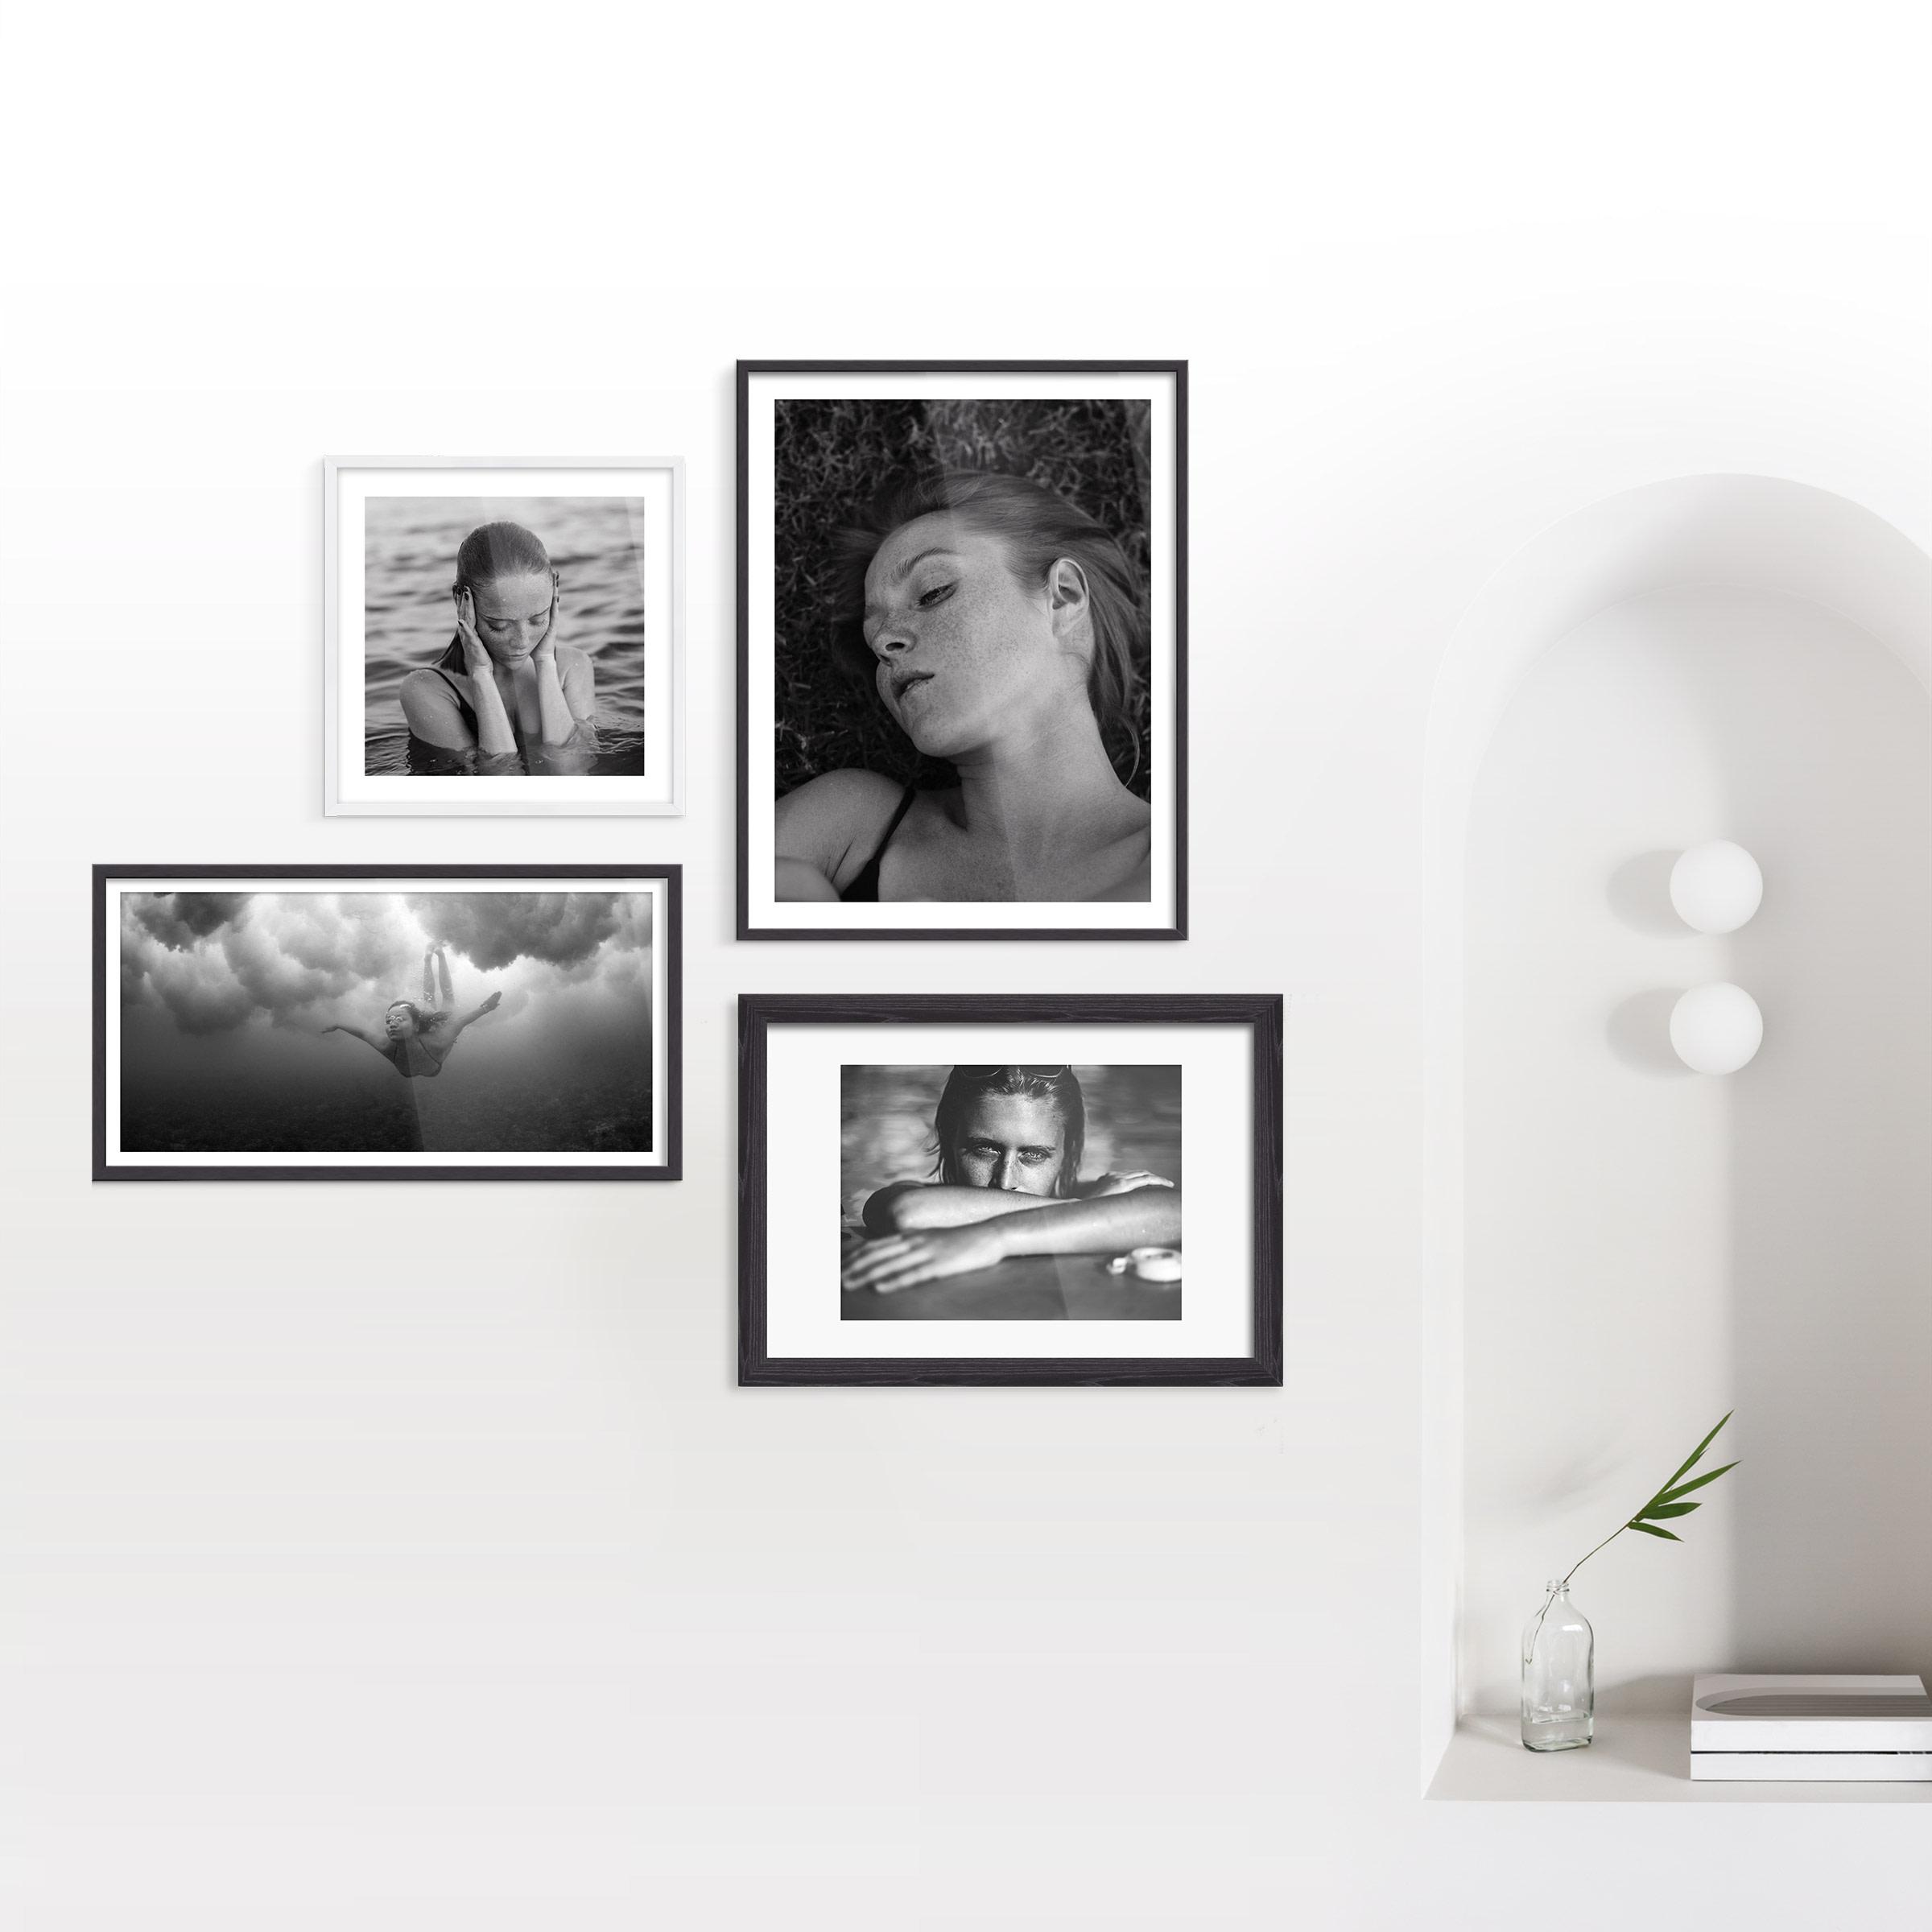 fotoabzug-barytpapier-portrait-inspiration-1200x1200.jpg